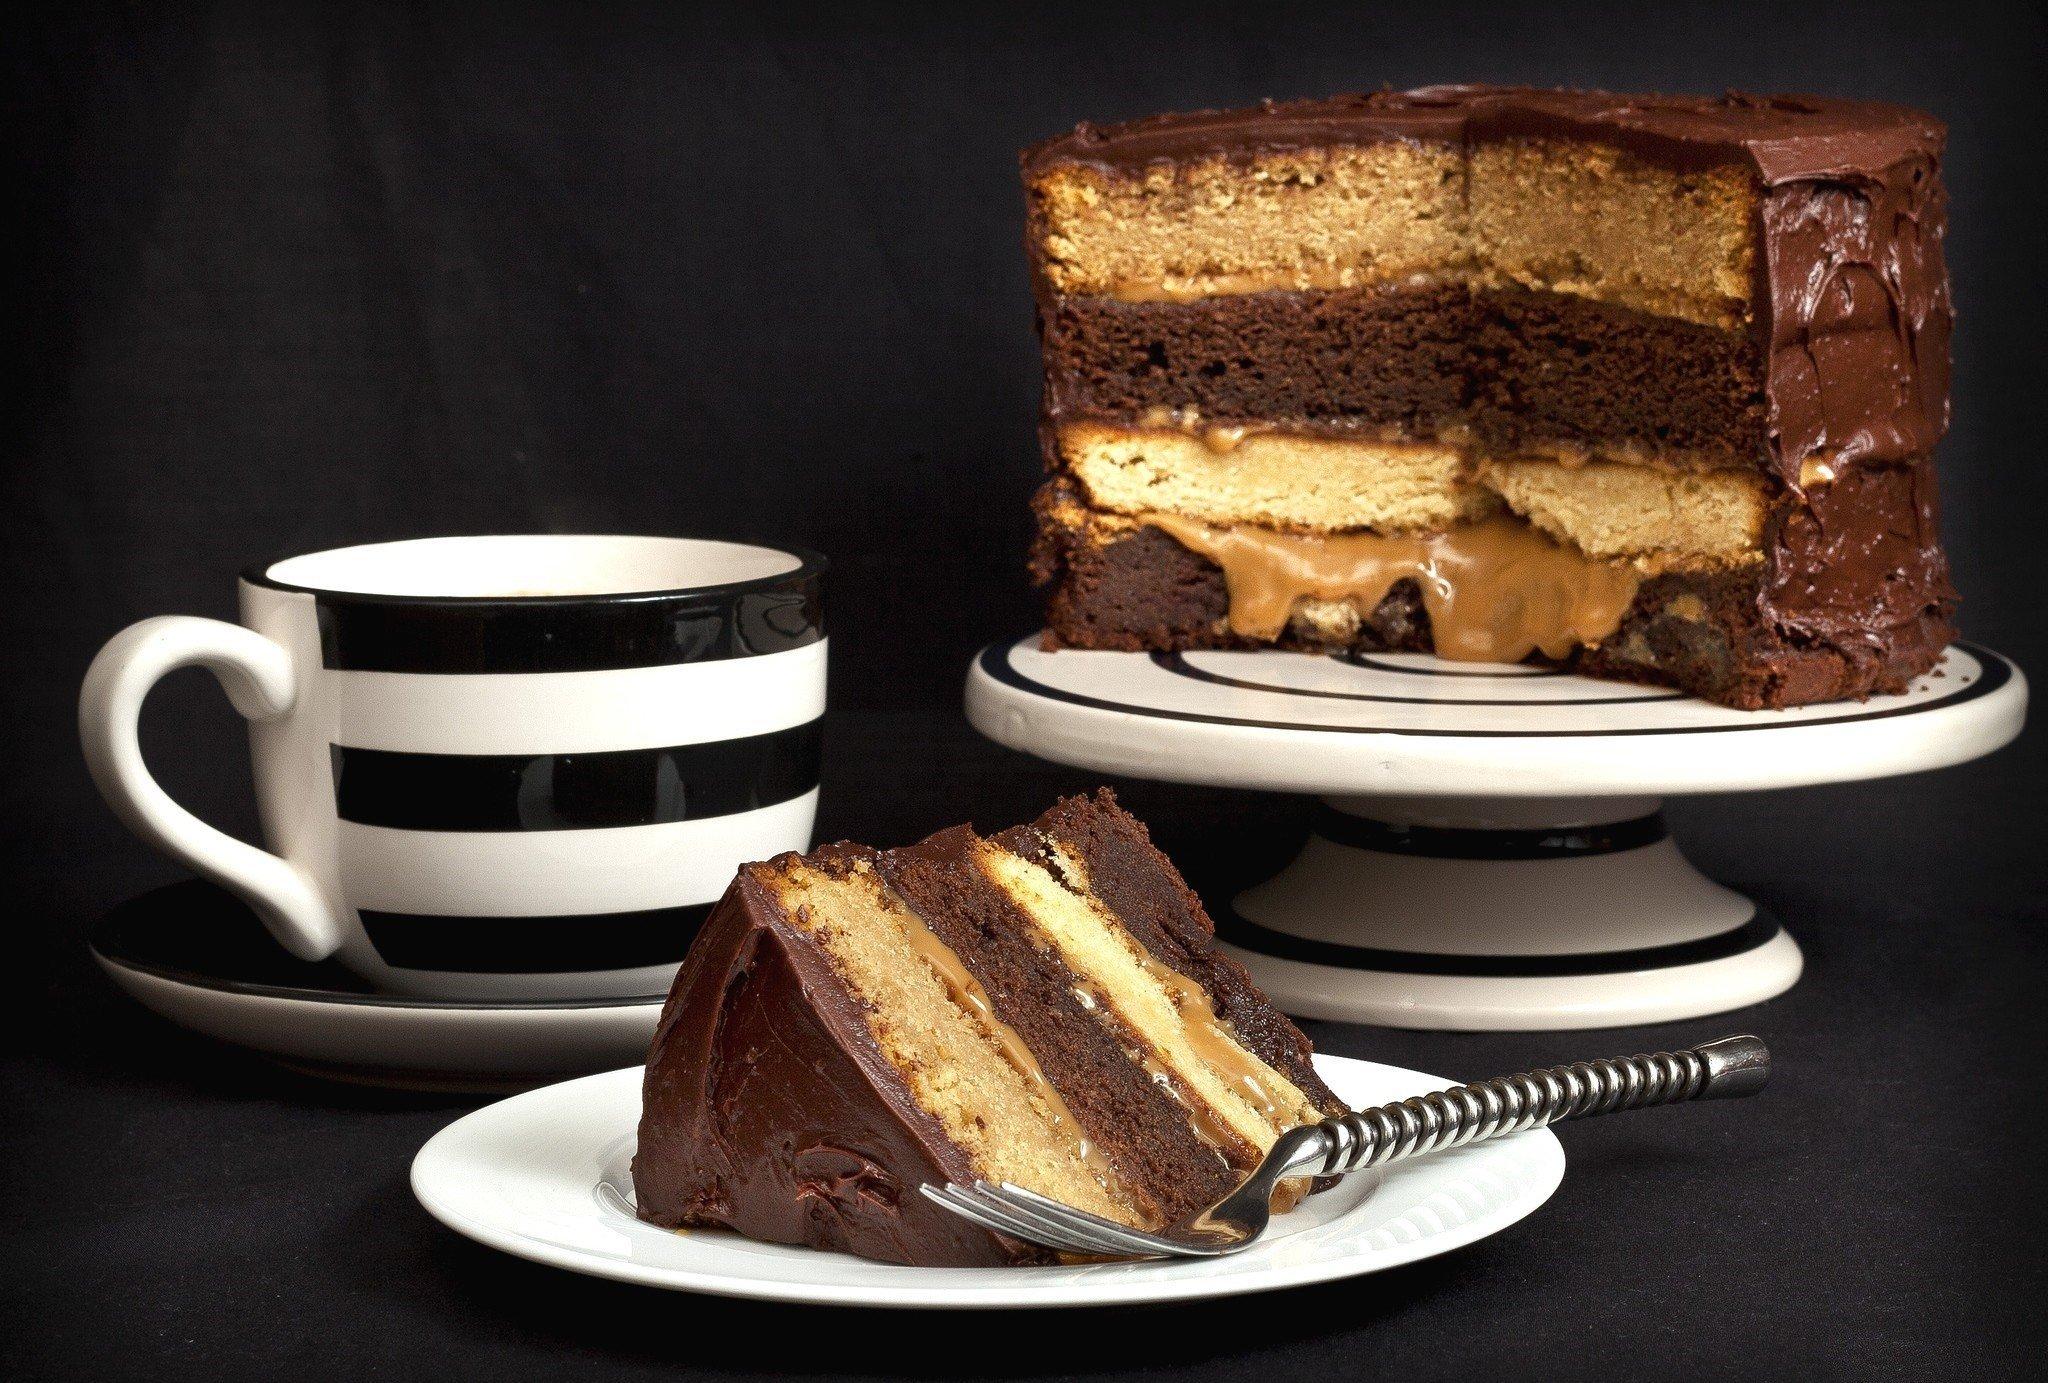 Baggrunde Mad Kage Kop Dessert Chokoladekage Kiks